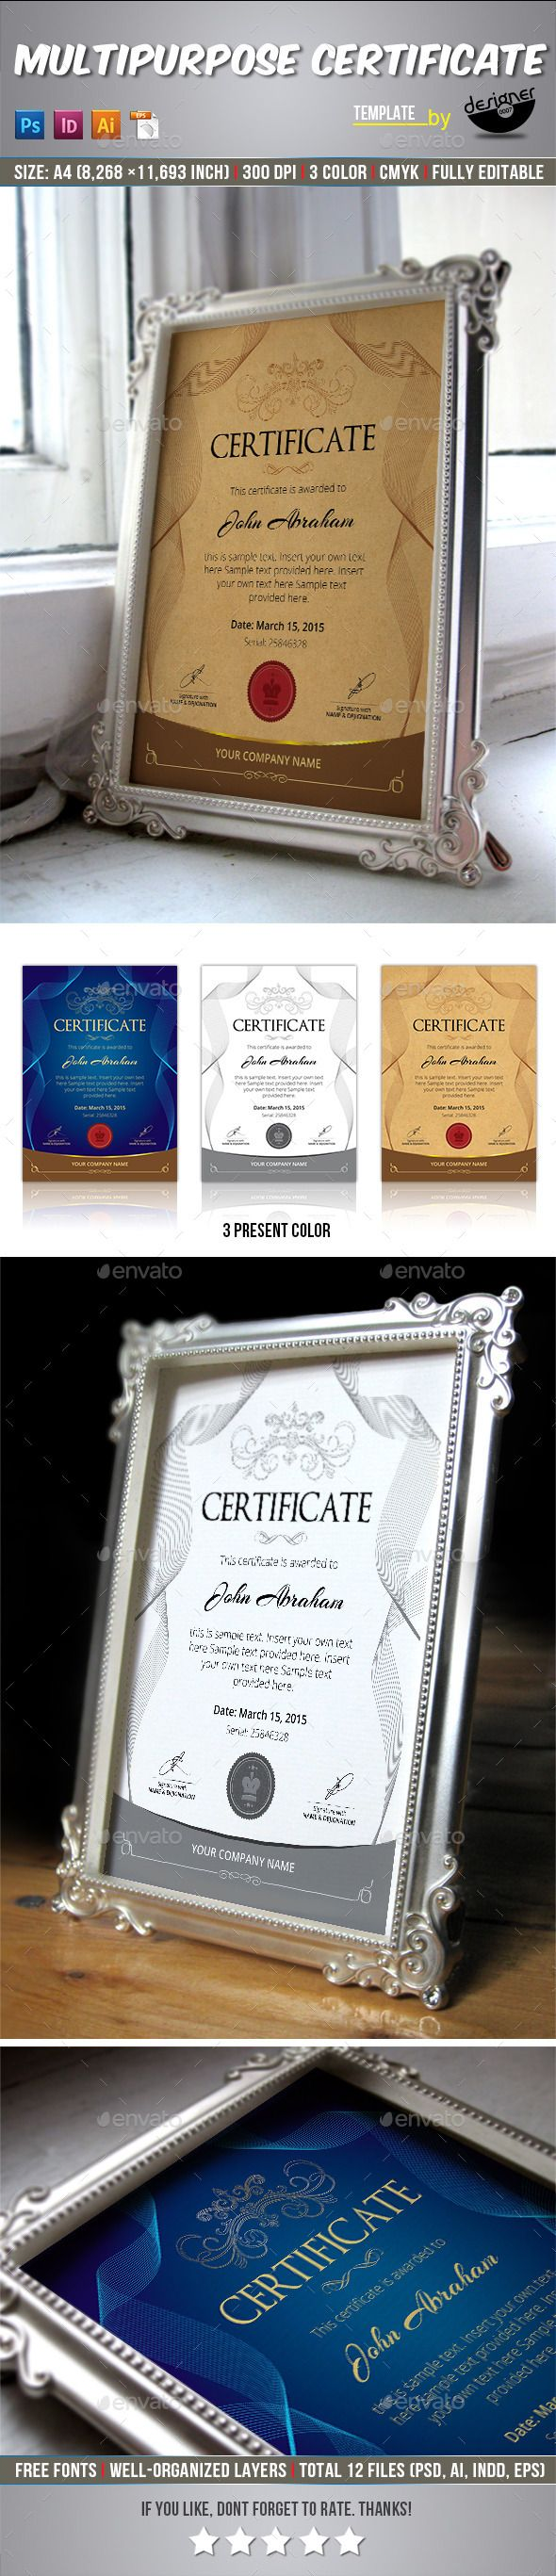 25 unique certificate templates ideas on pinterest free multipurpose certificate template yadclub Choice Image